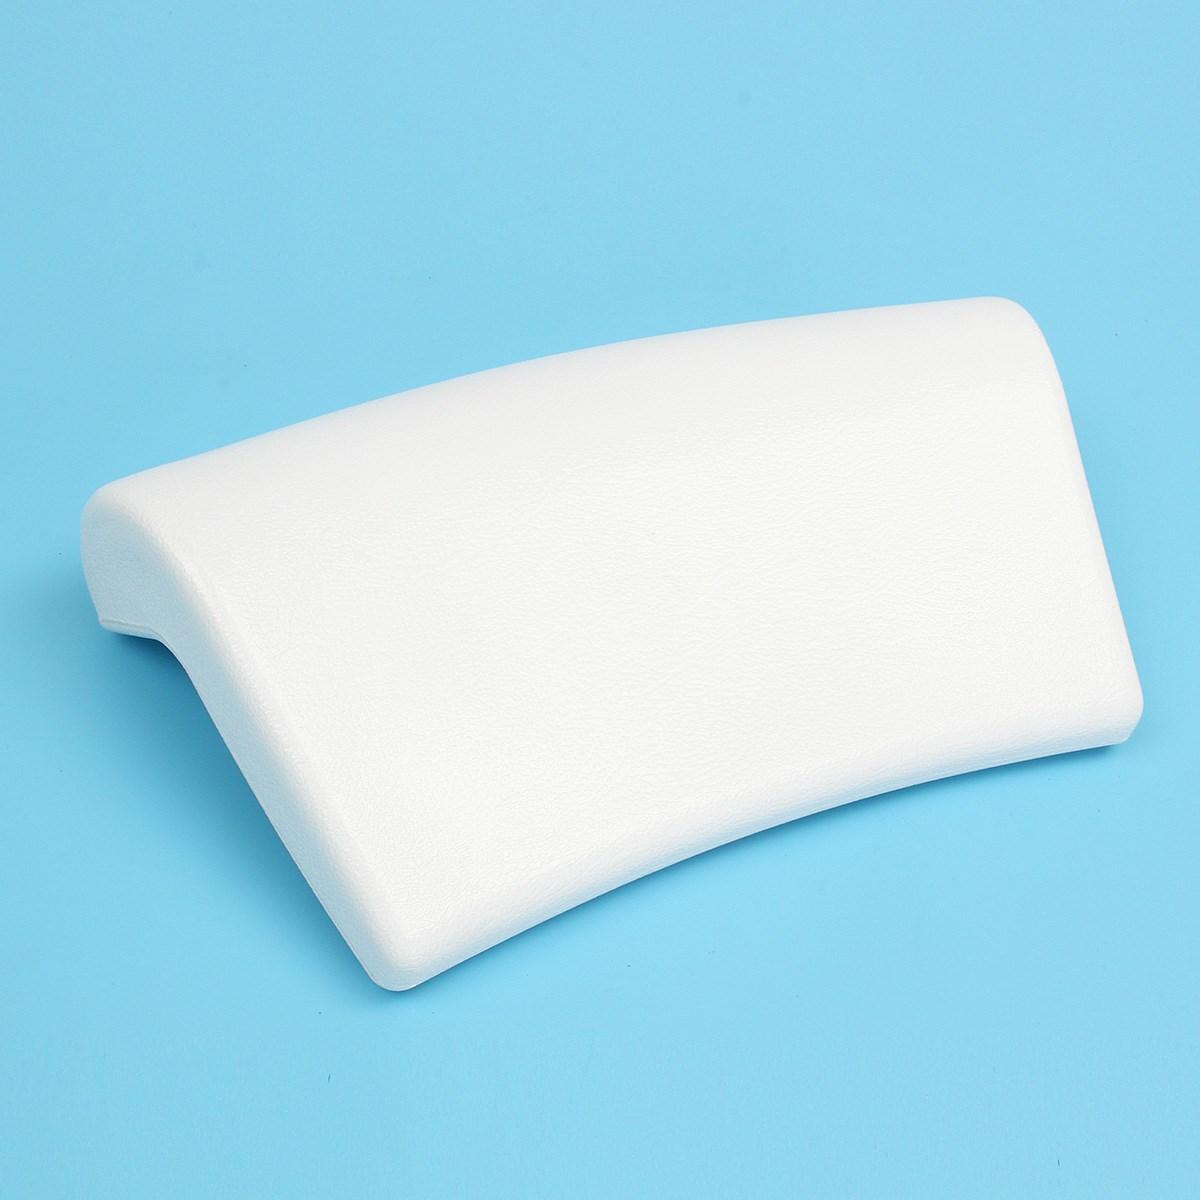 Popular Bathtub Cushions Buy Cheap Bathtub Cushions Lots